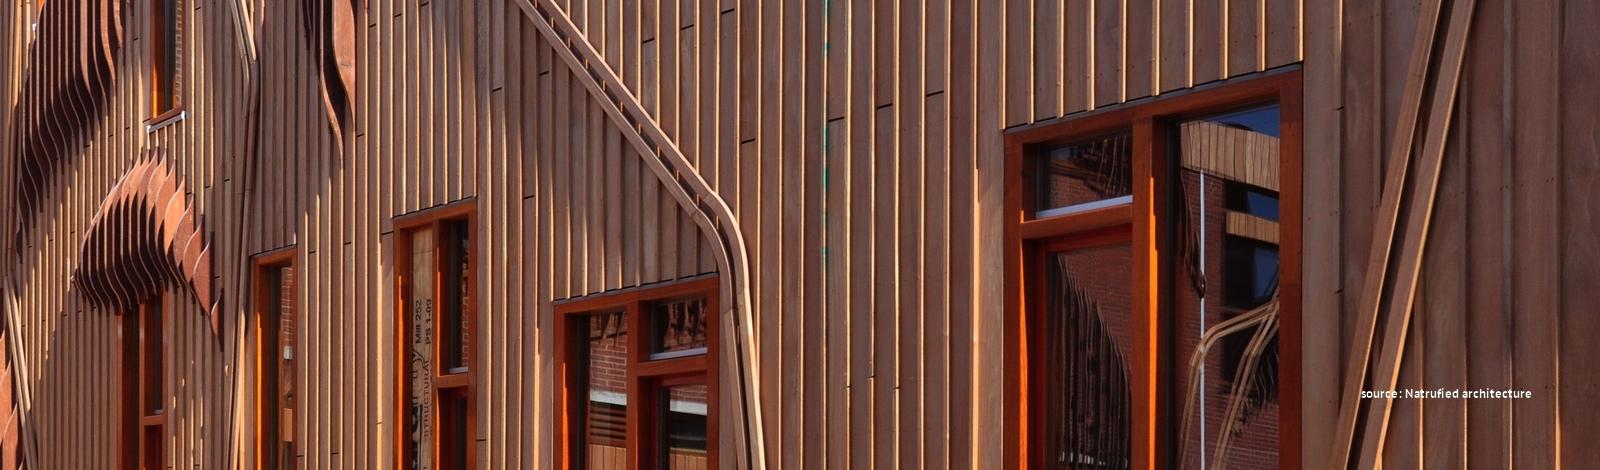 Mare college, Natrufied Architecture